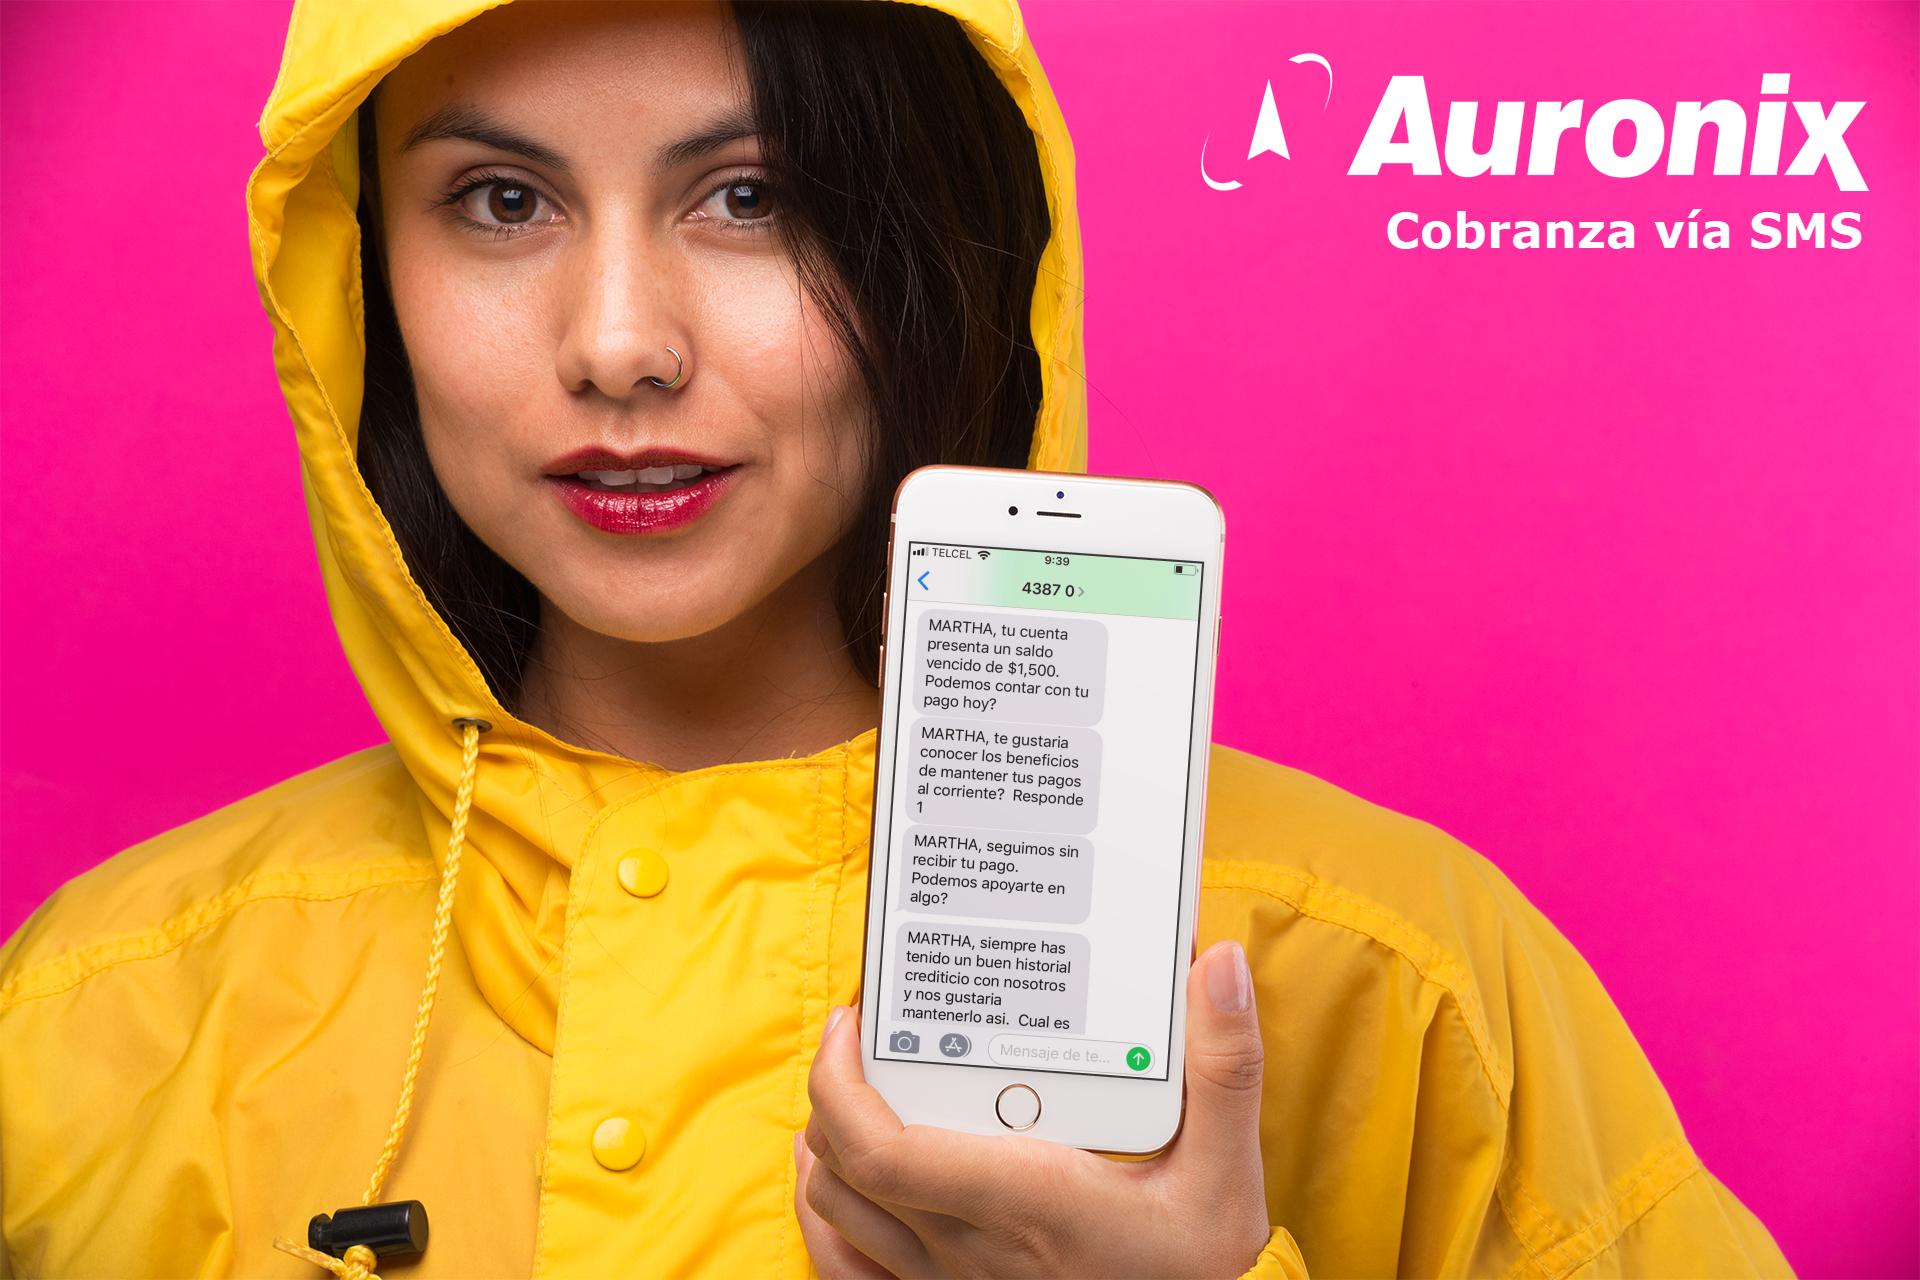 sms cobranza via texto insistente con calixta de auronix-1